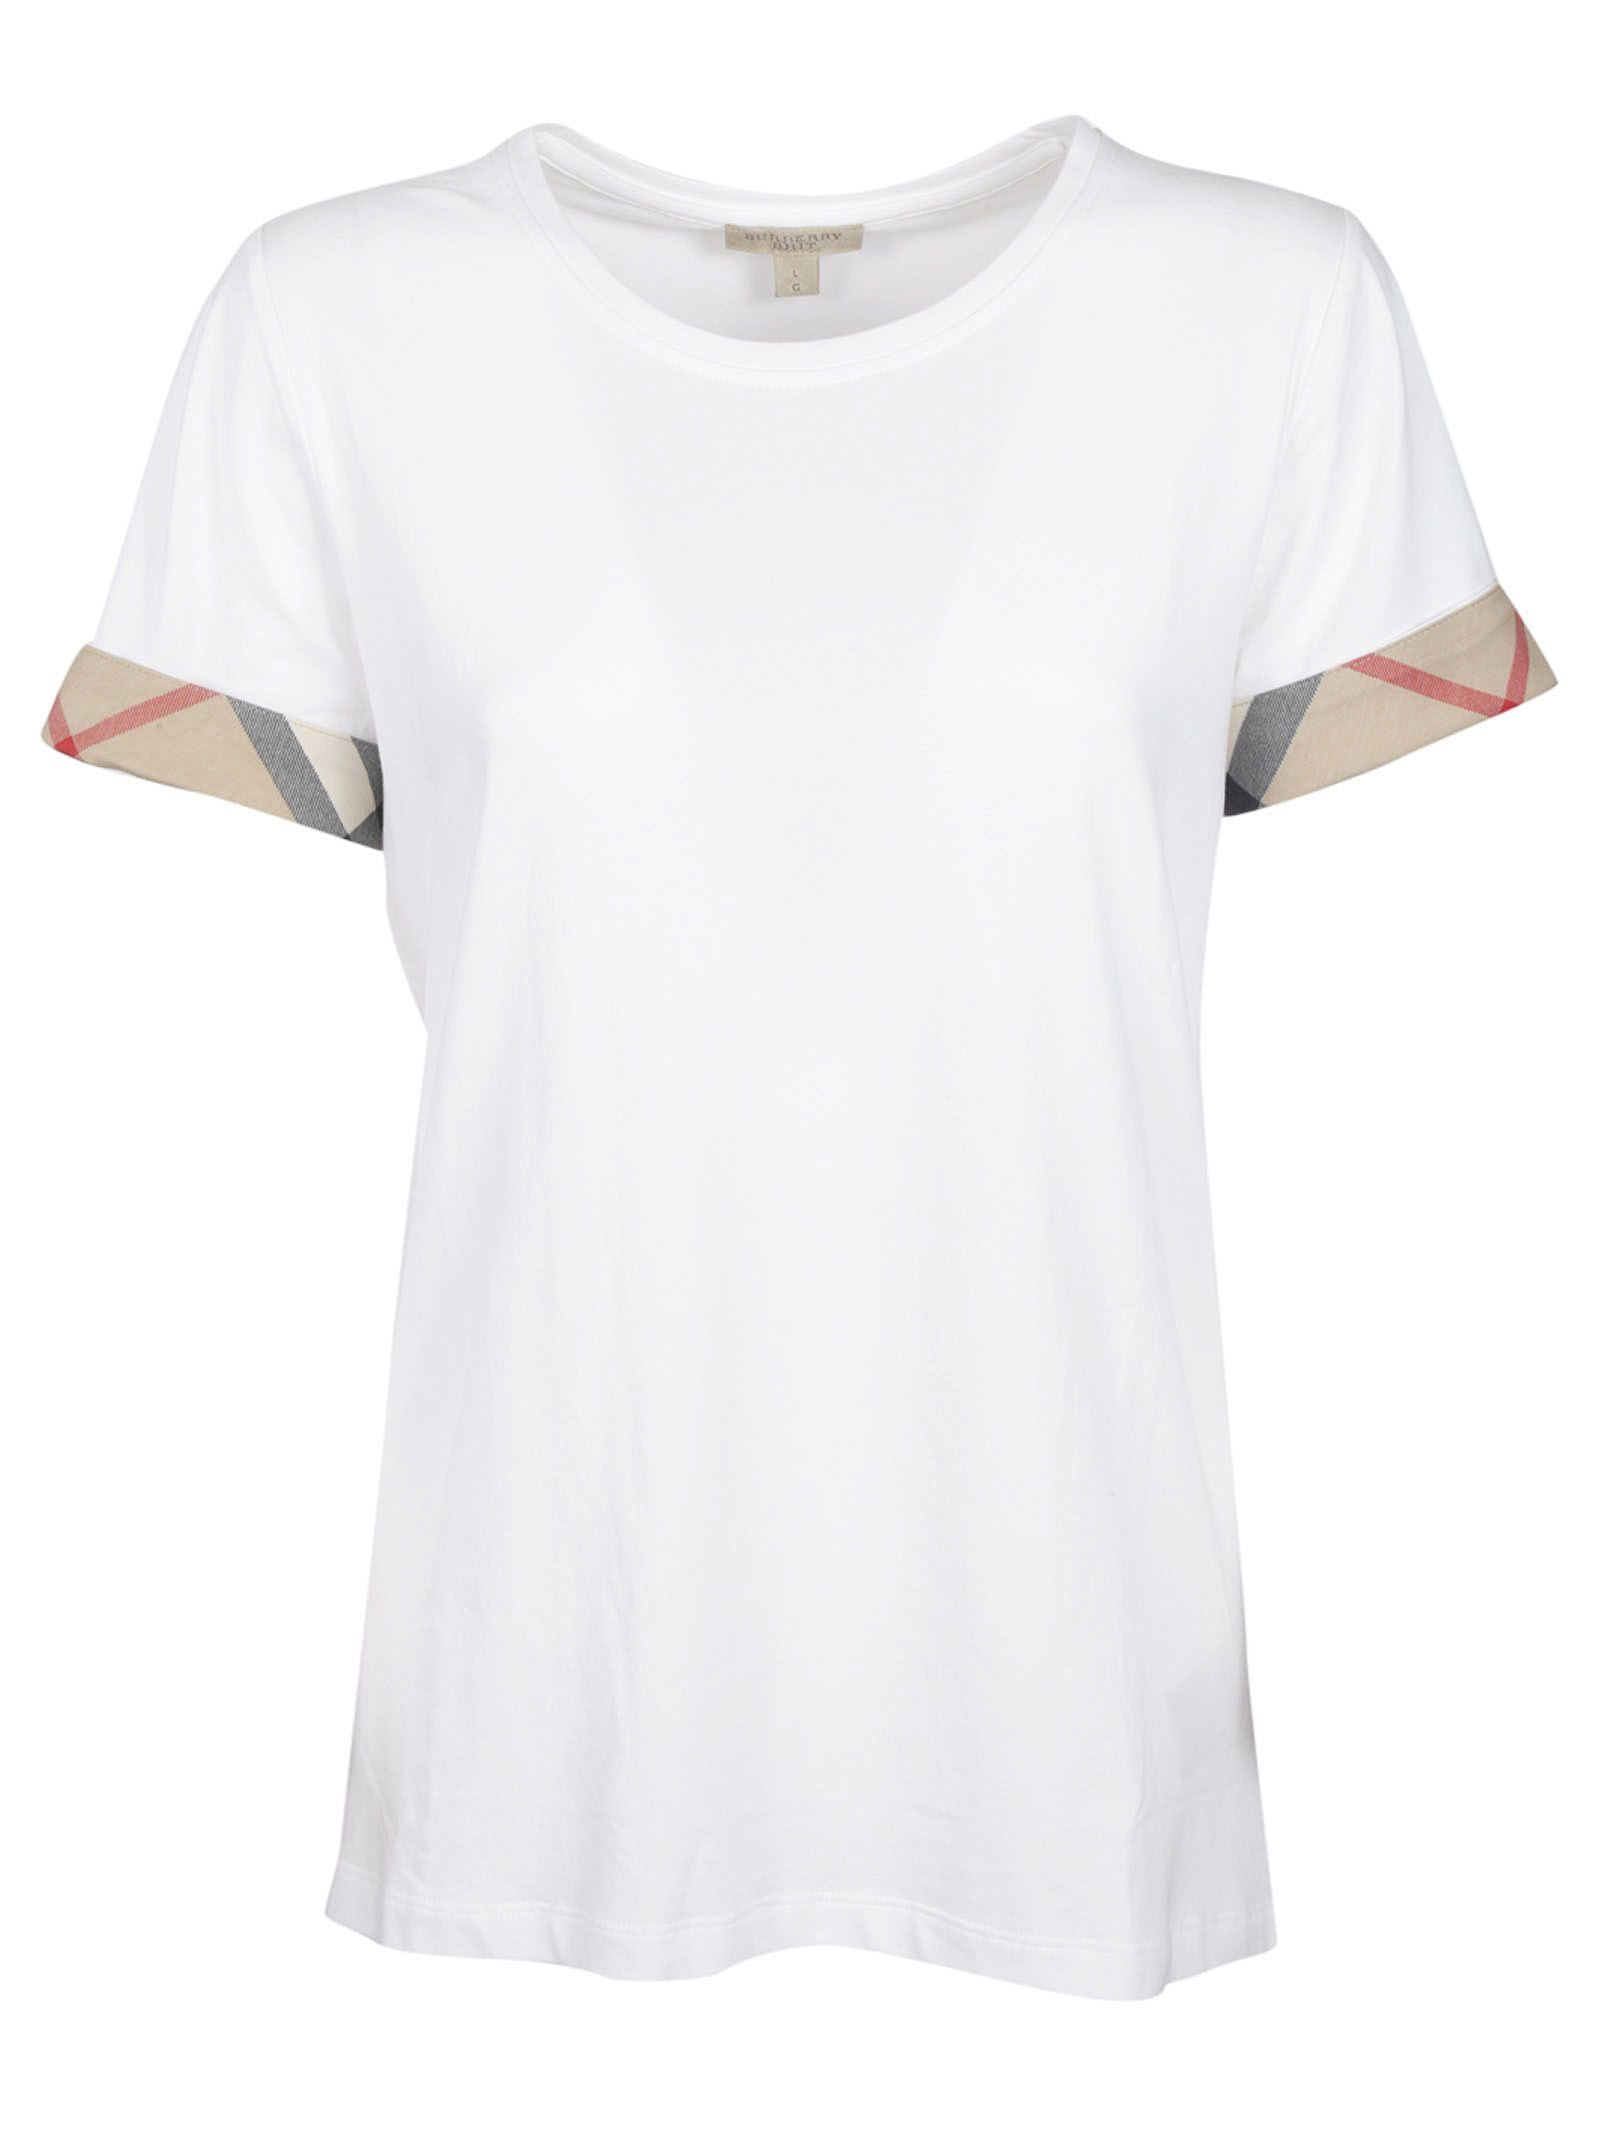 Burberry House Check Cuffs T-shirt